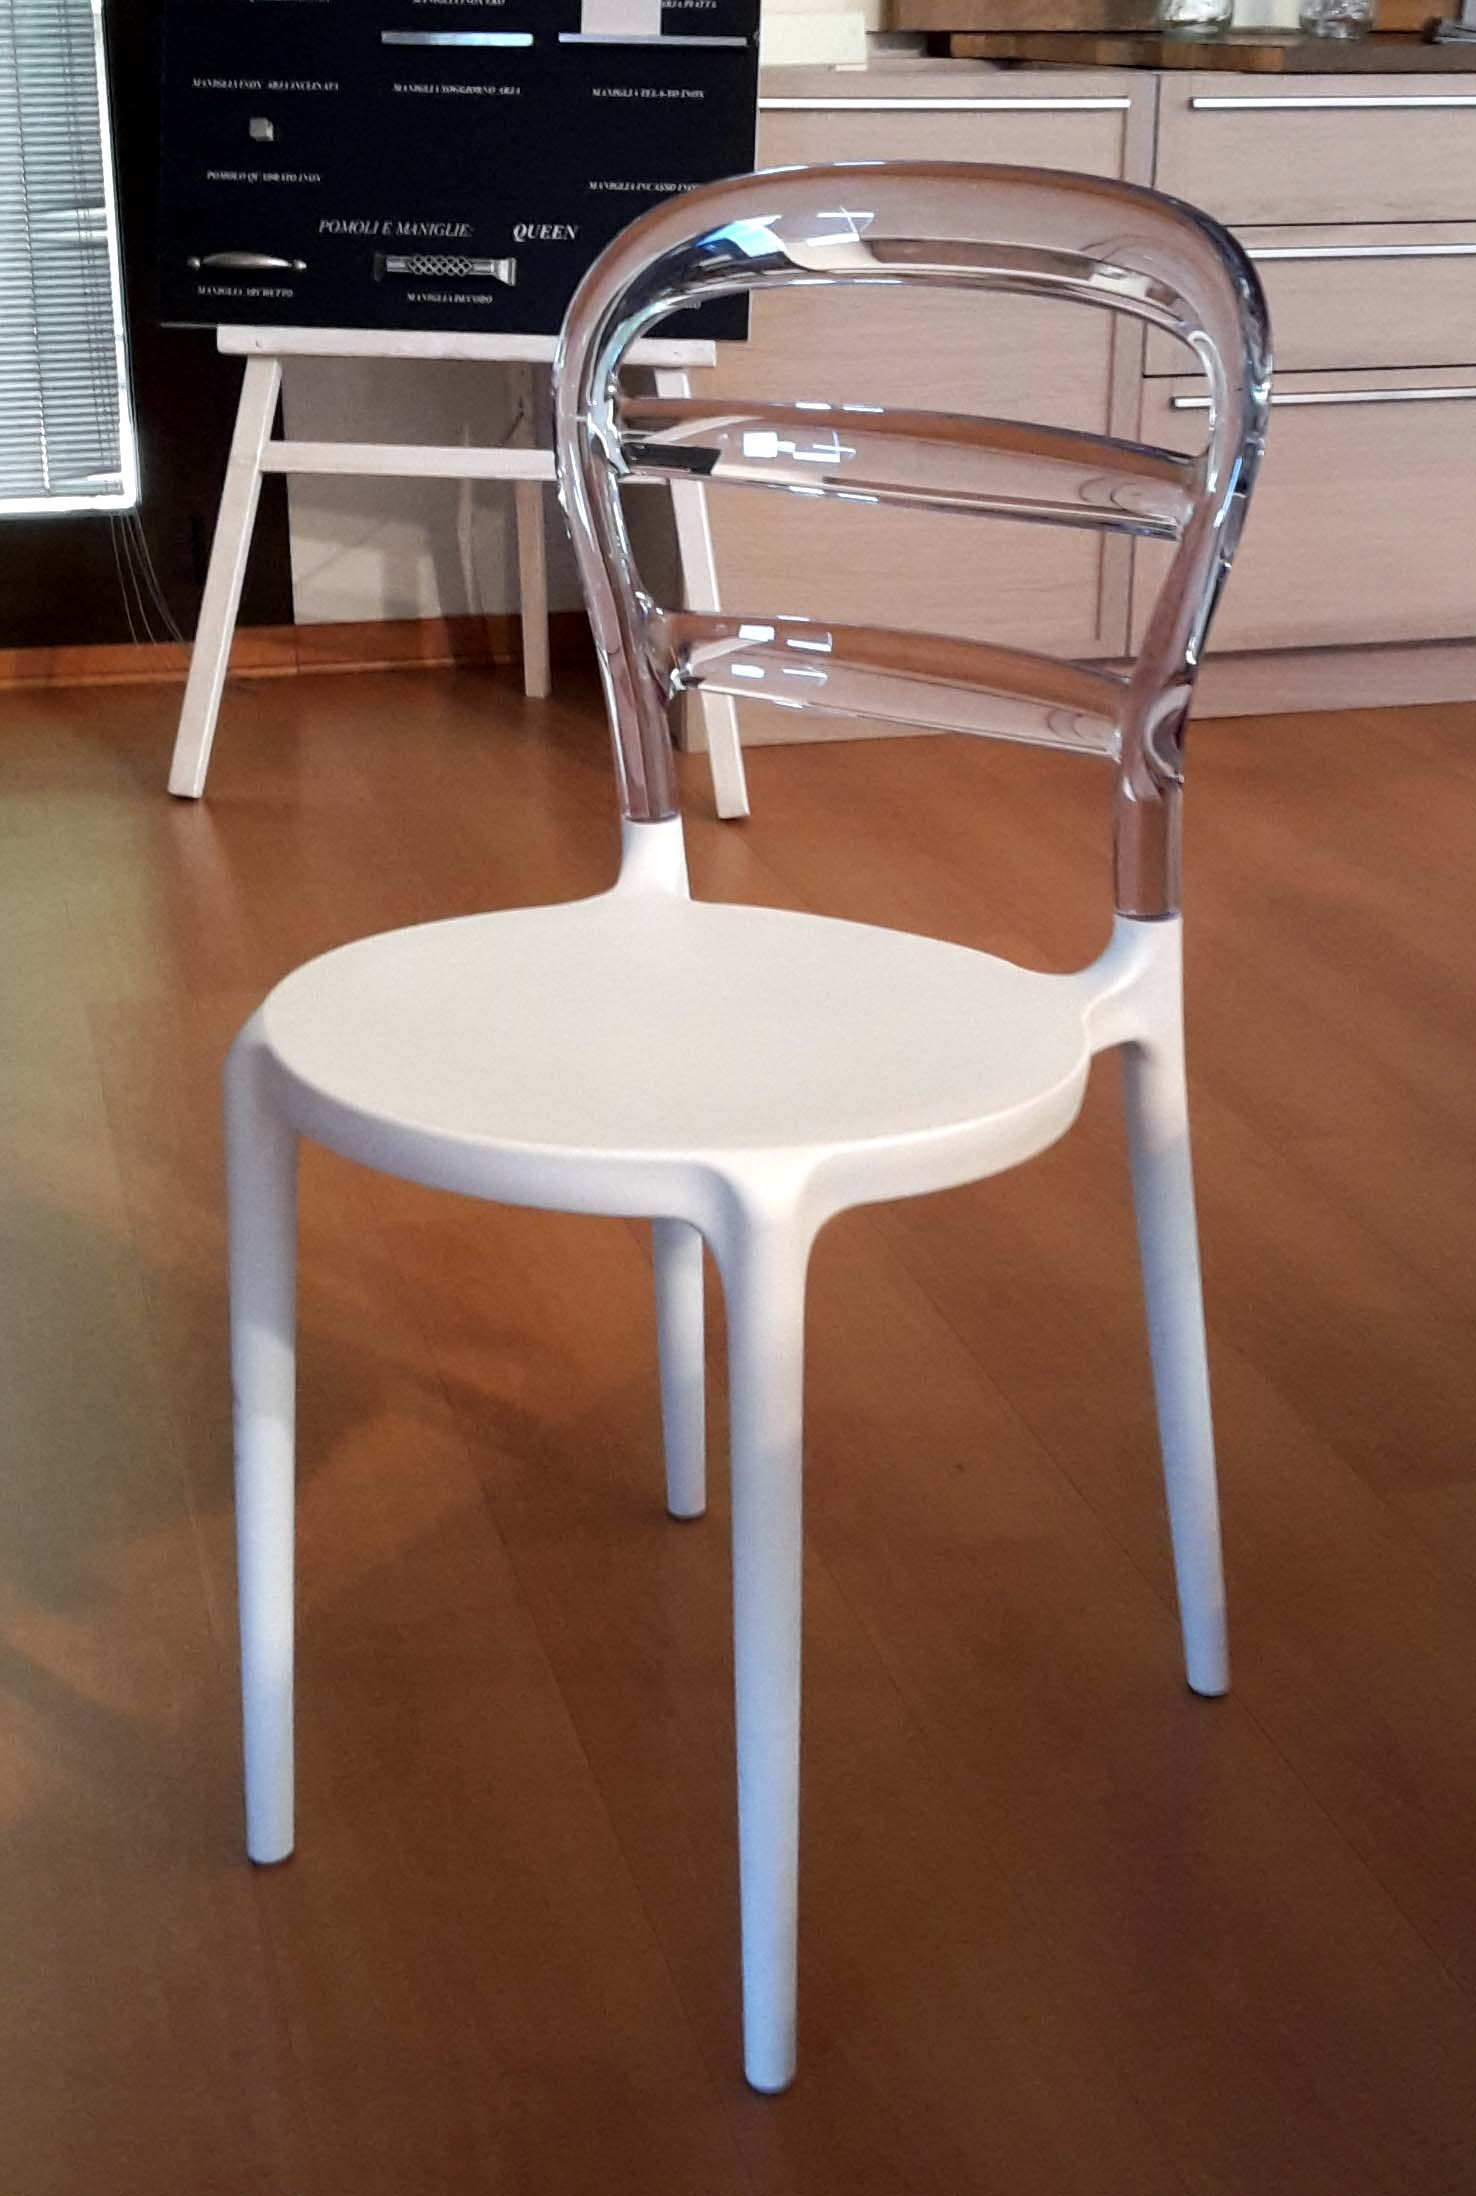 Sedia eurosedia free sedie a prezzi scontati for Sedie design online